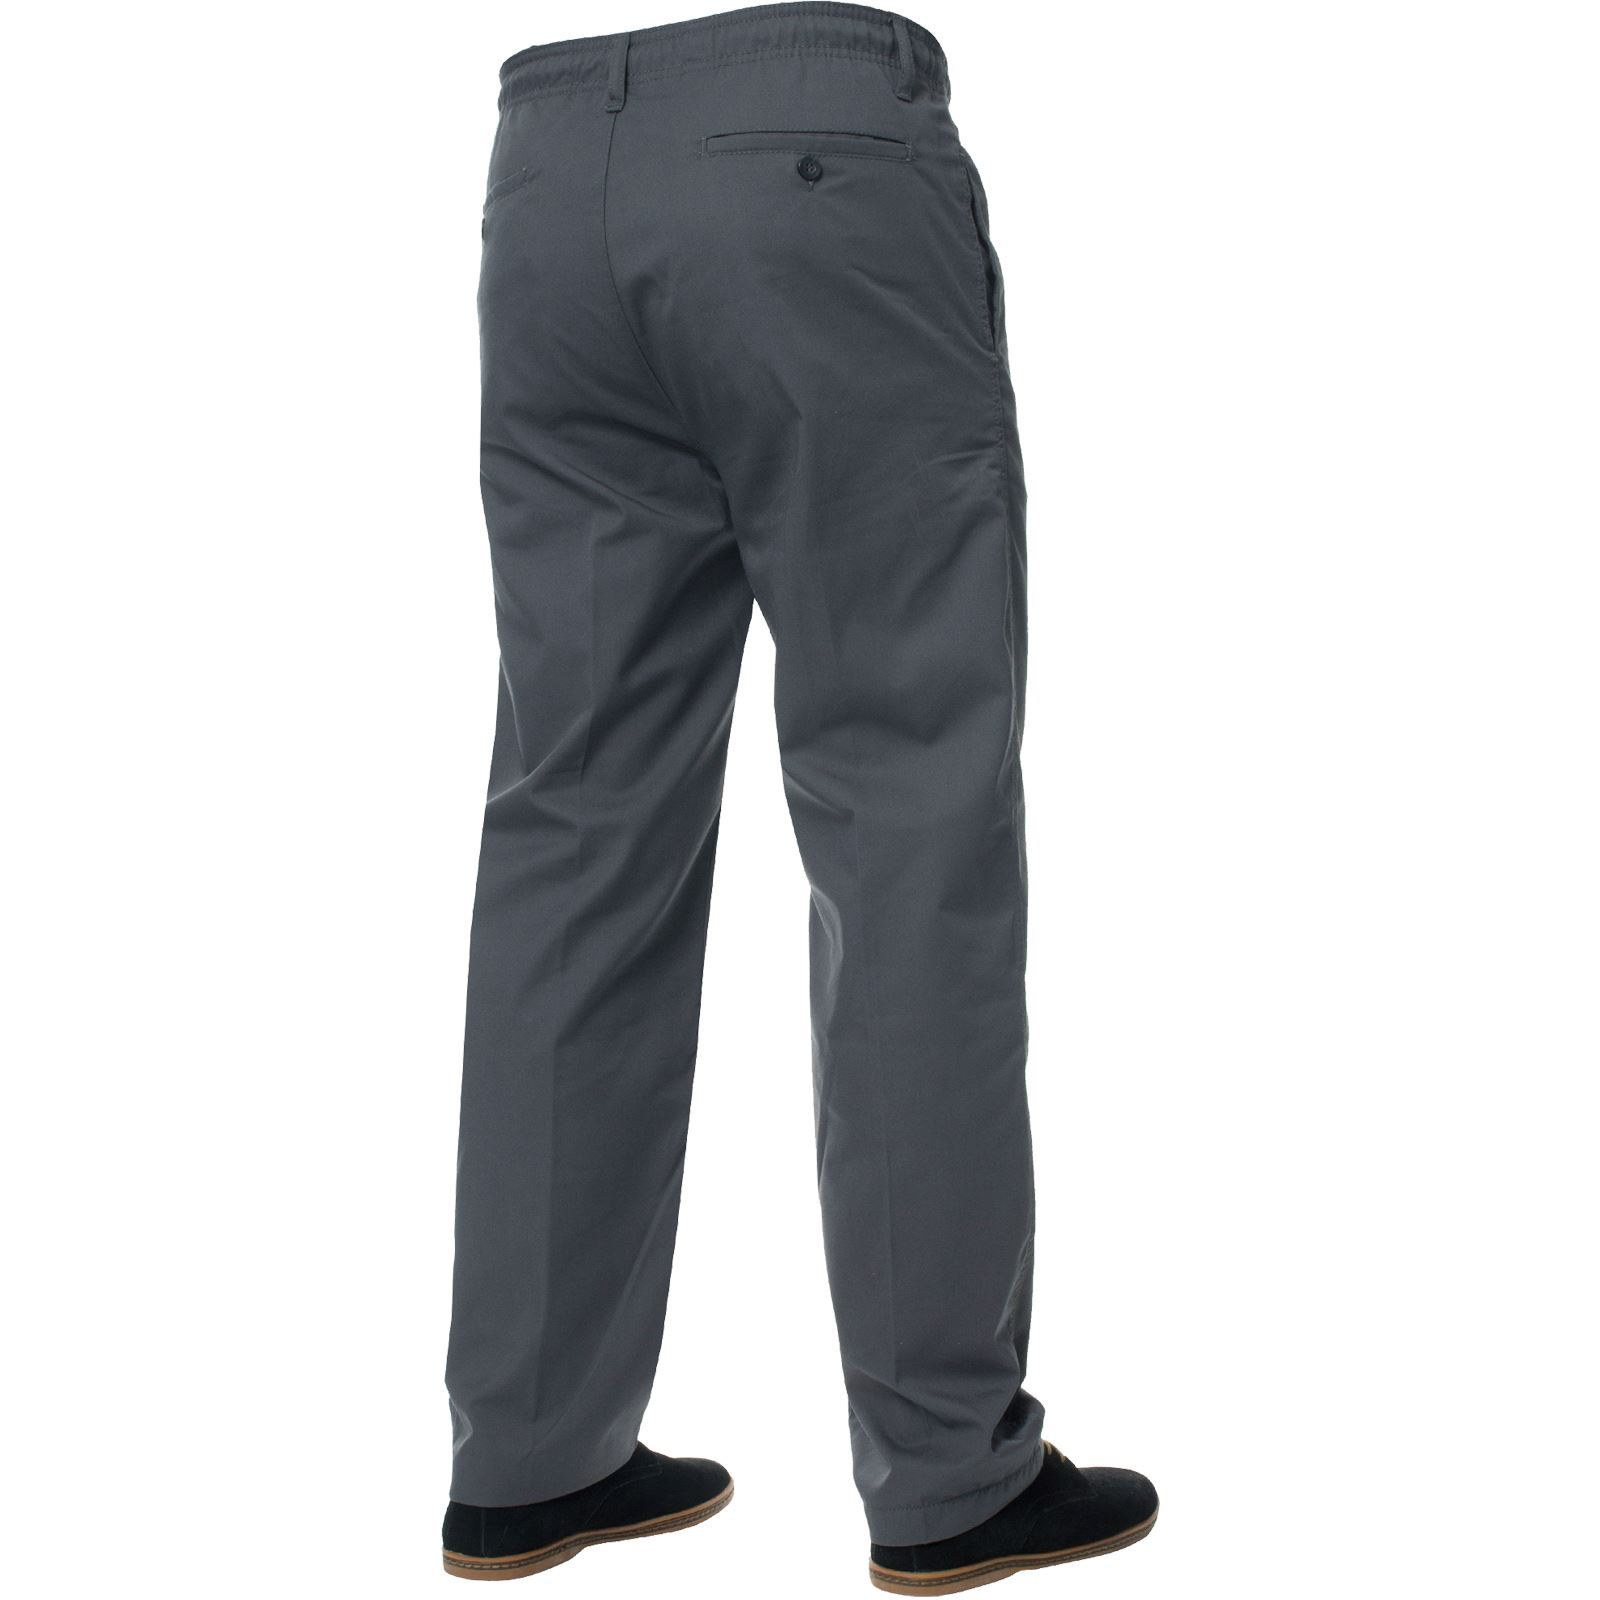 Para-Hombres-Pantalones-De-Rugby-Kruze-cintura-elastica-con-cordon-pantalones-REGULAR-King-Tamanos miniatura 27